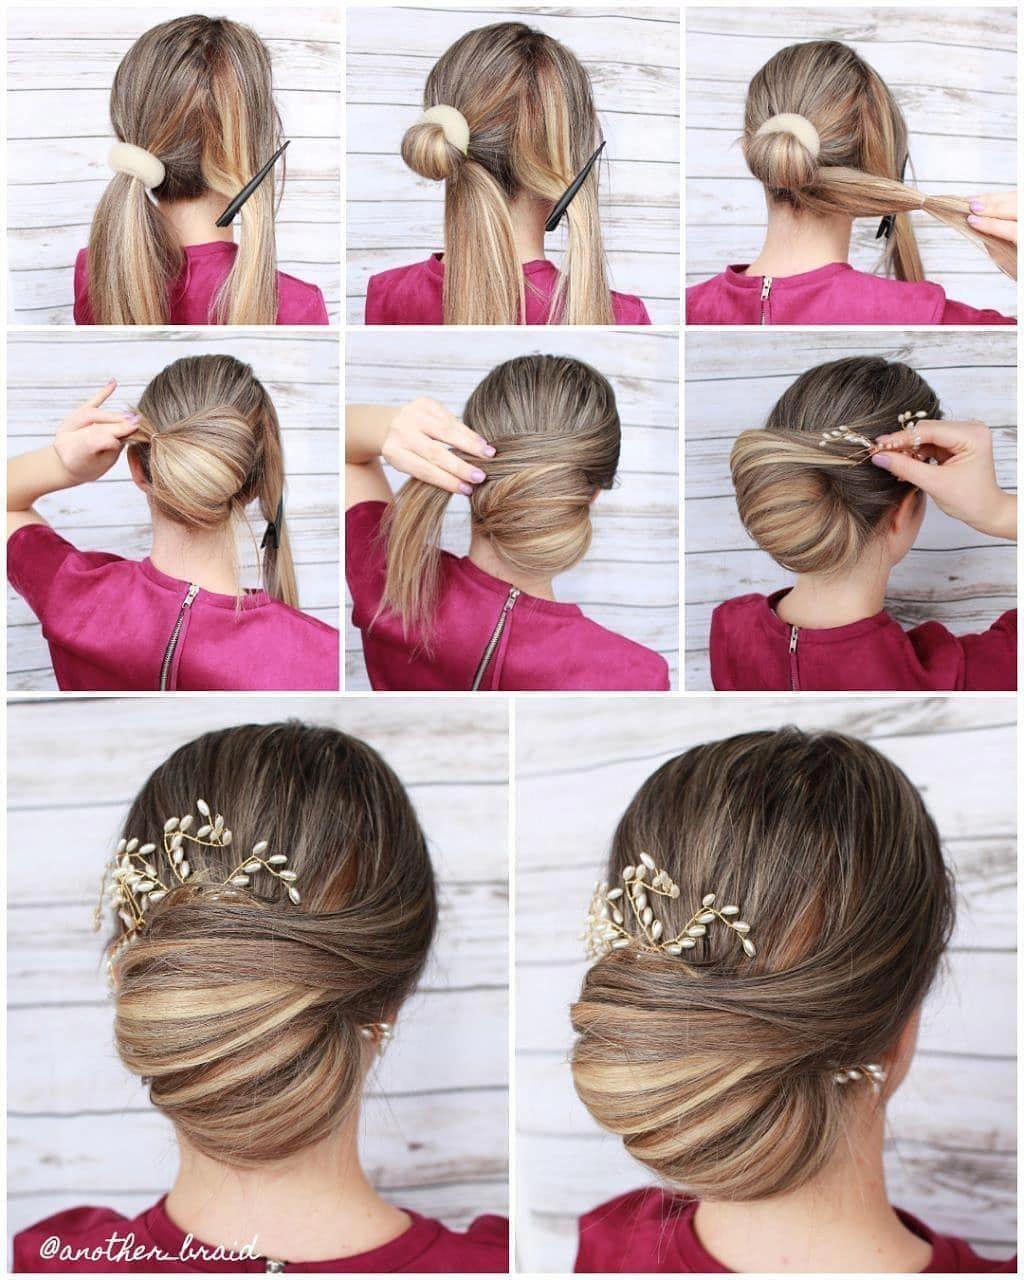 "HAIRFY Hair Tutorials on Instagram: ""Quick & simple Updo tutorial"